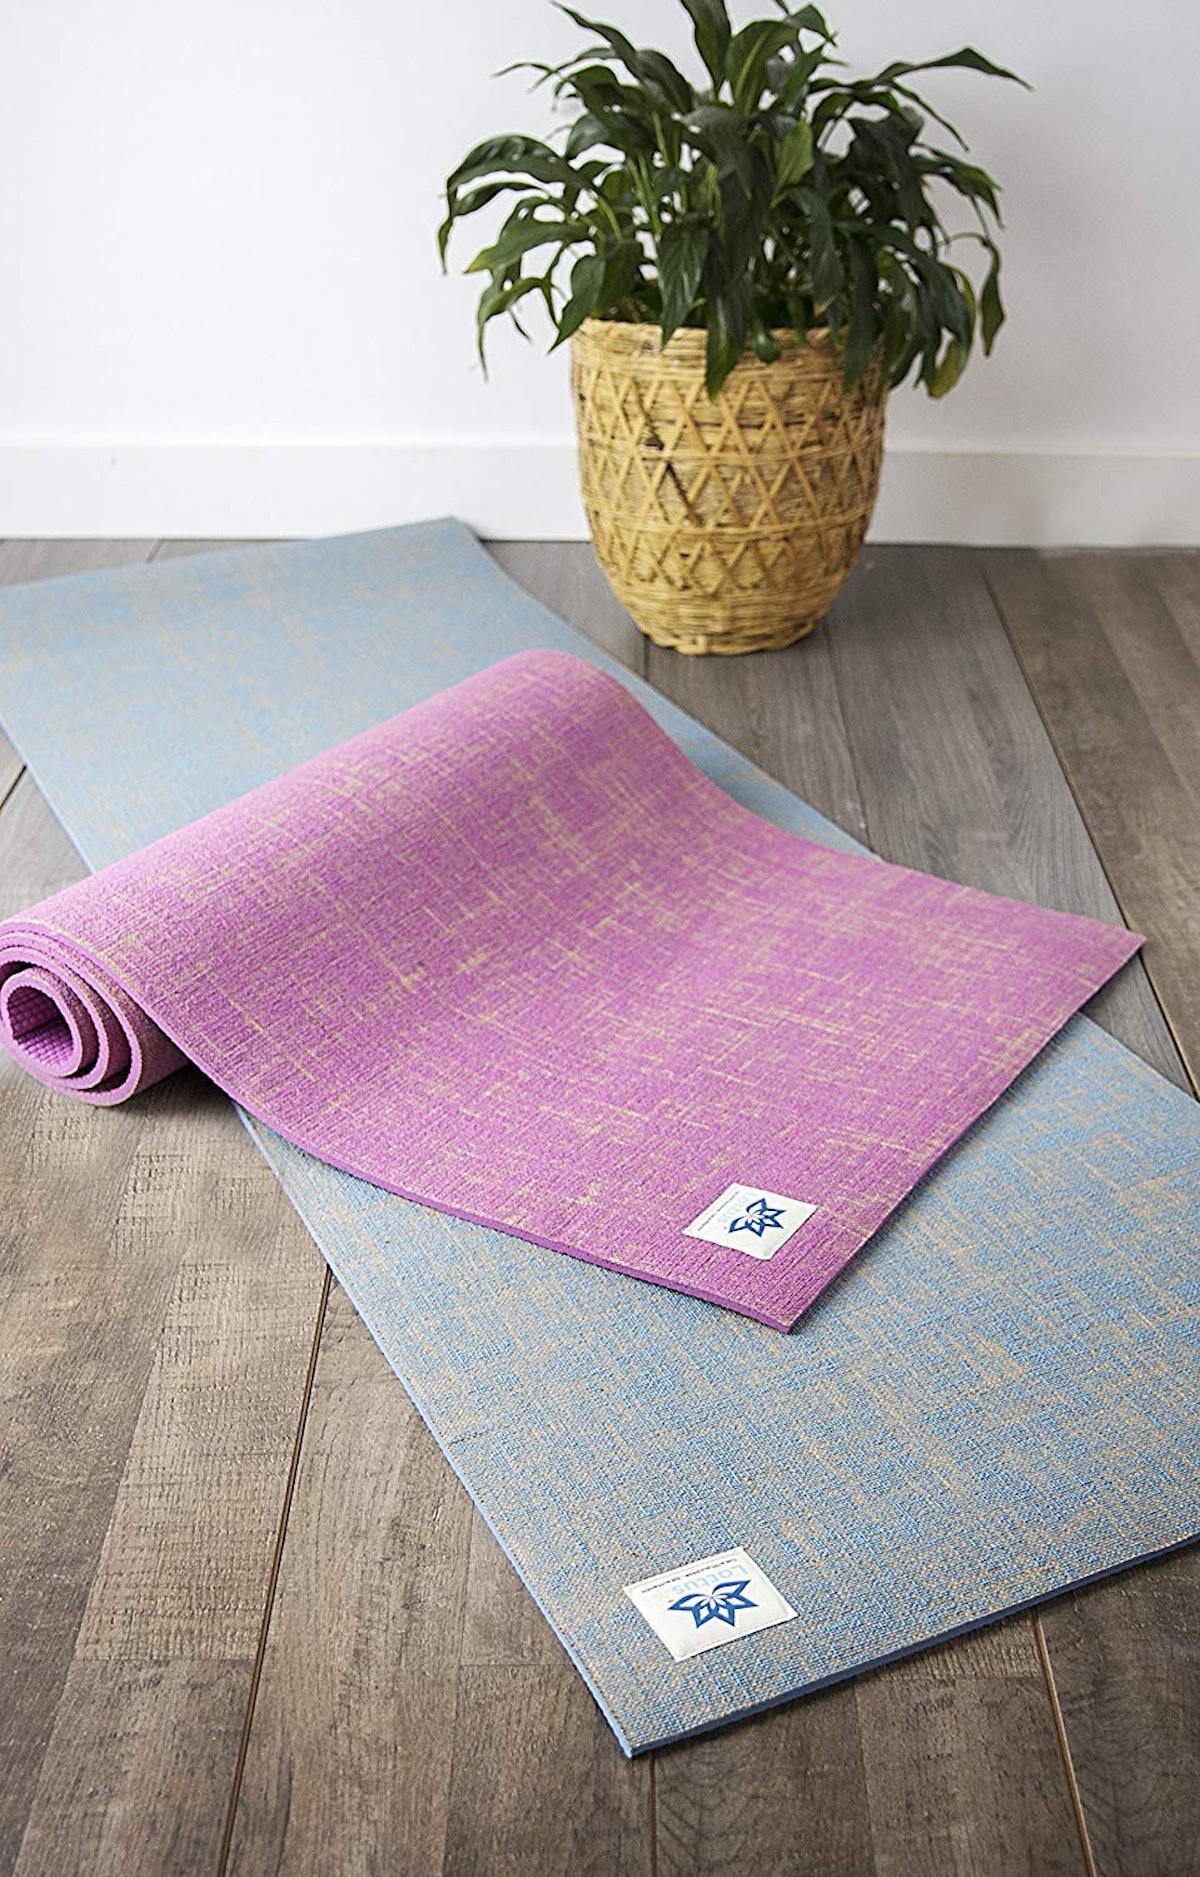 Lottus Life Natural Jute Fiber Yoga Mat